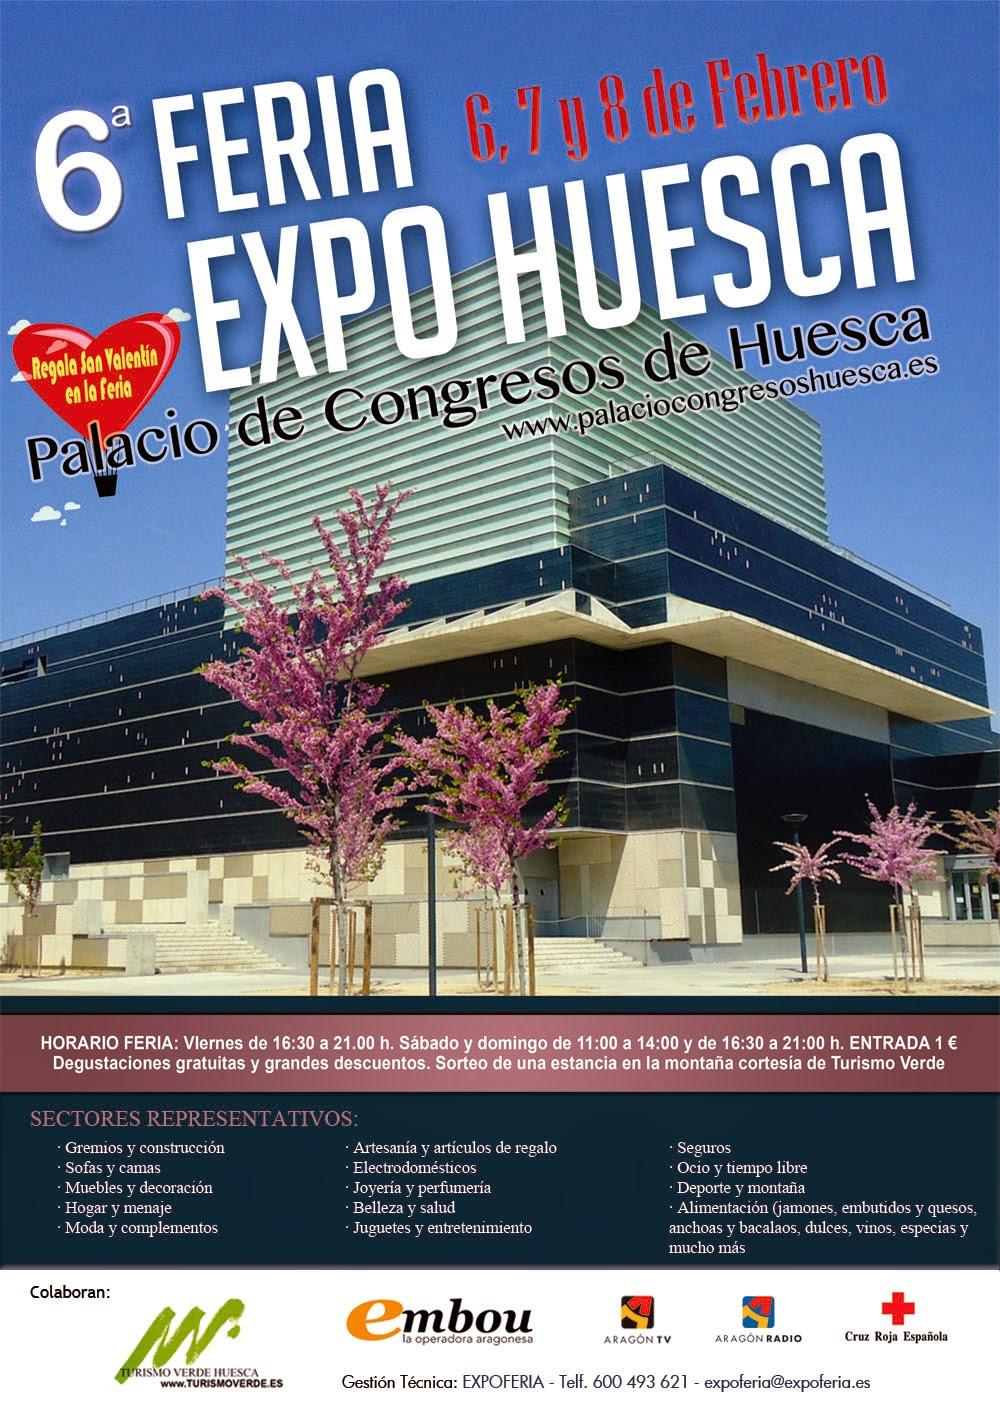 6 feria expo huesca la magia de huesca - Electrodomesticos huesca ...